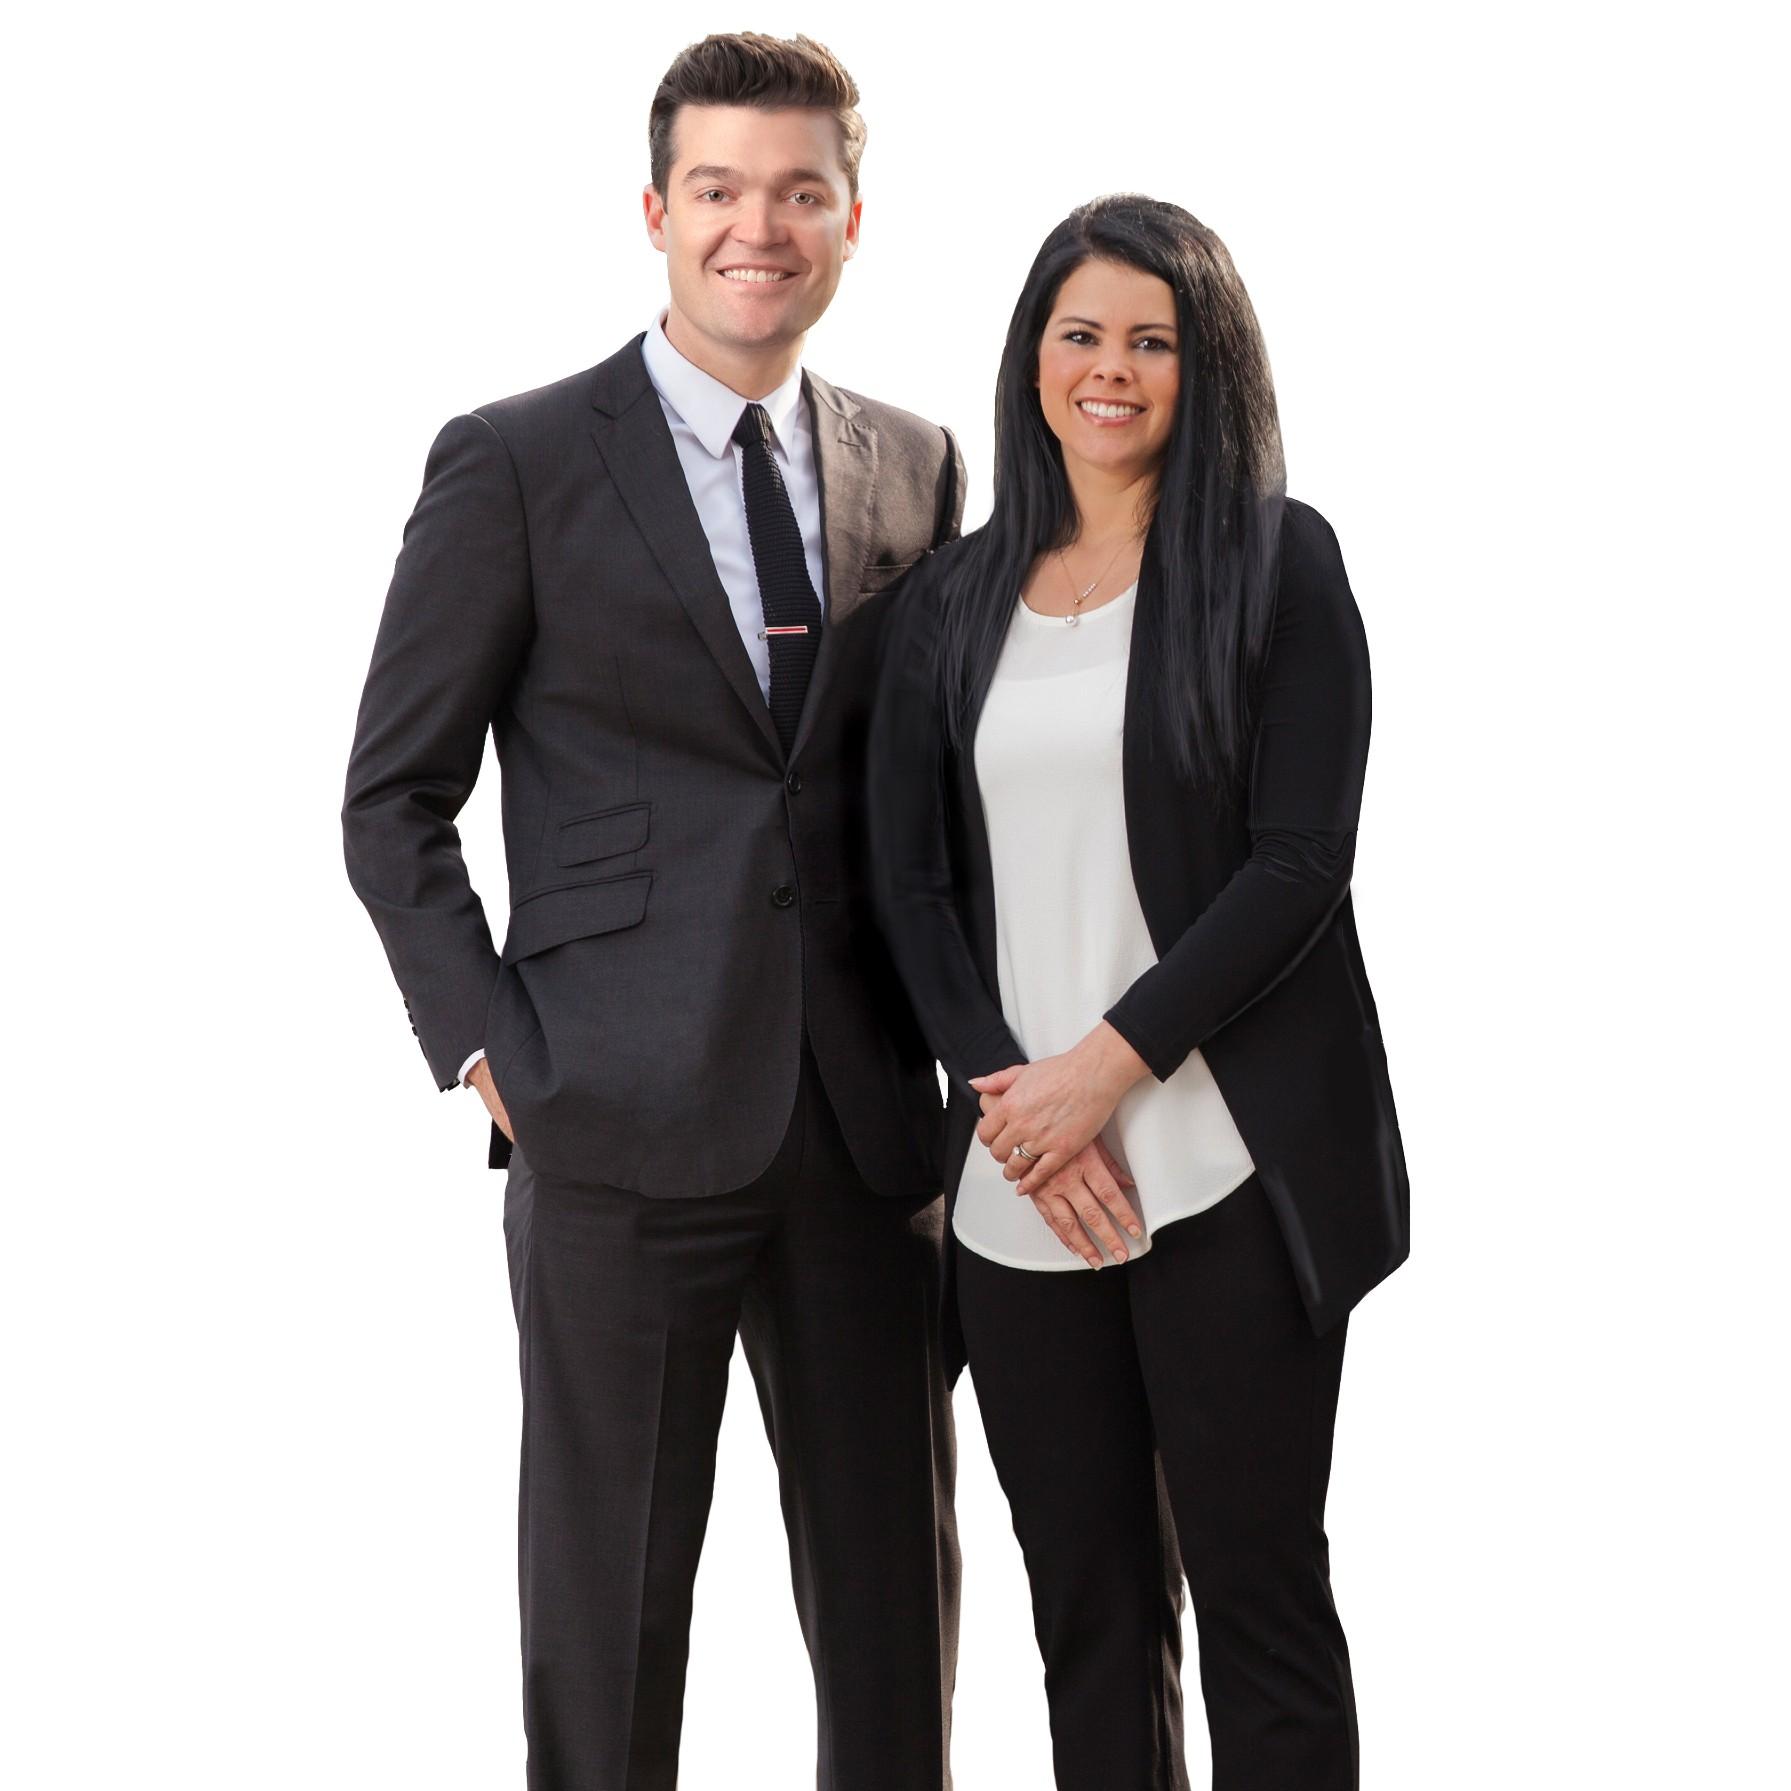 Nathan & Megan Morris : Morris Family Services President & Vice-President